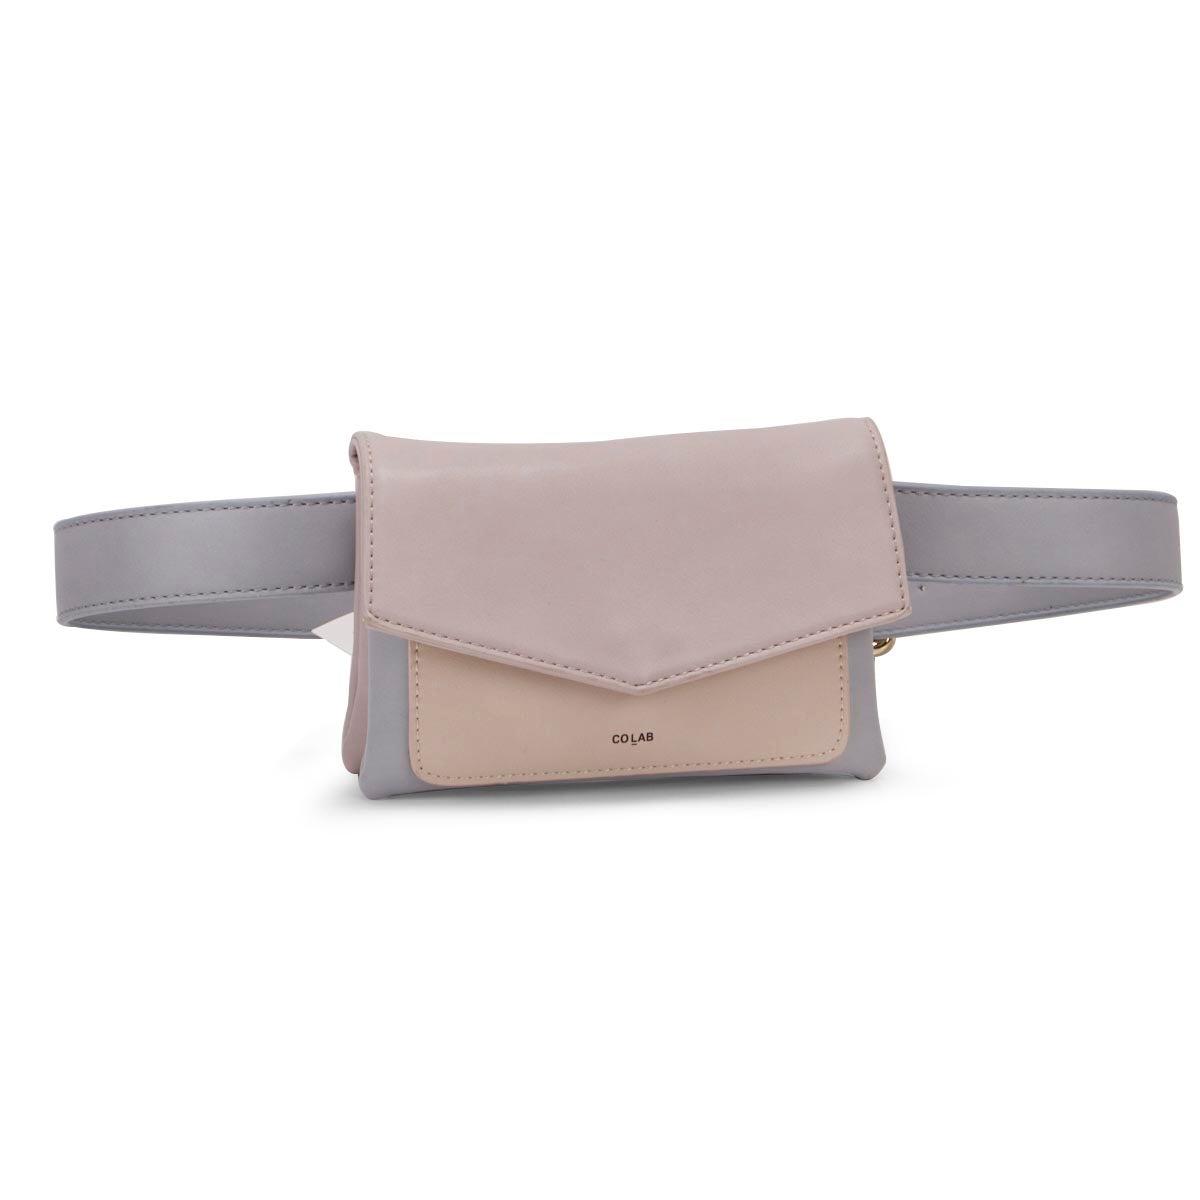 Lds pastel front flap fashion fanny pack